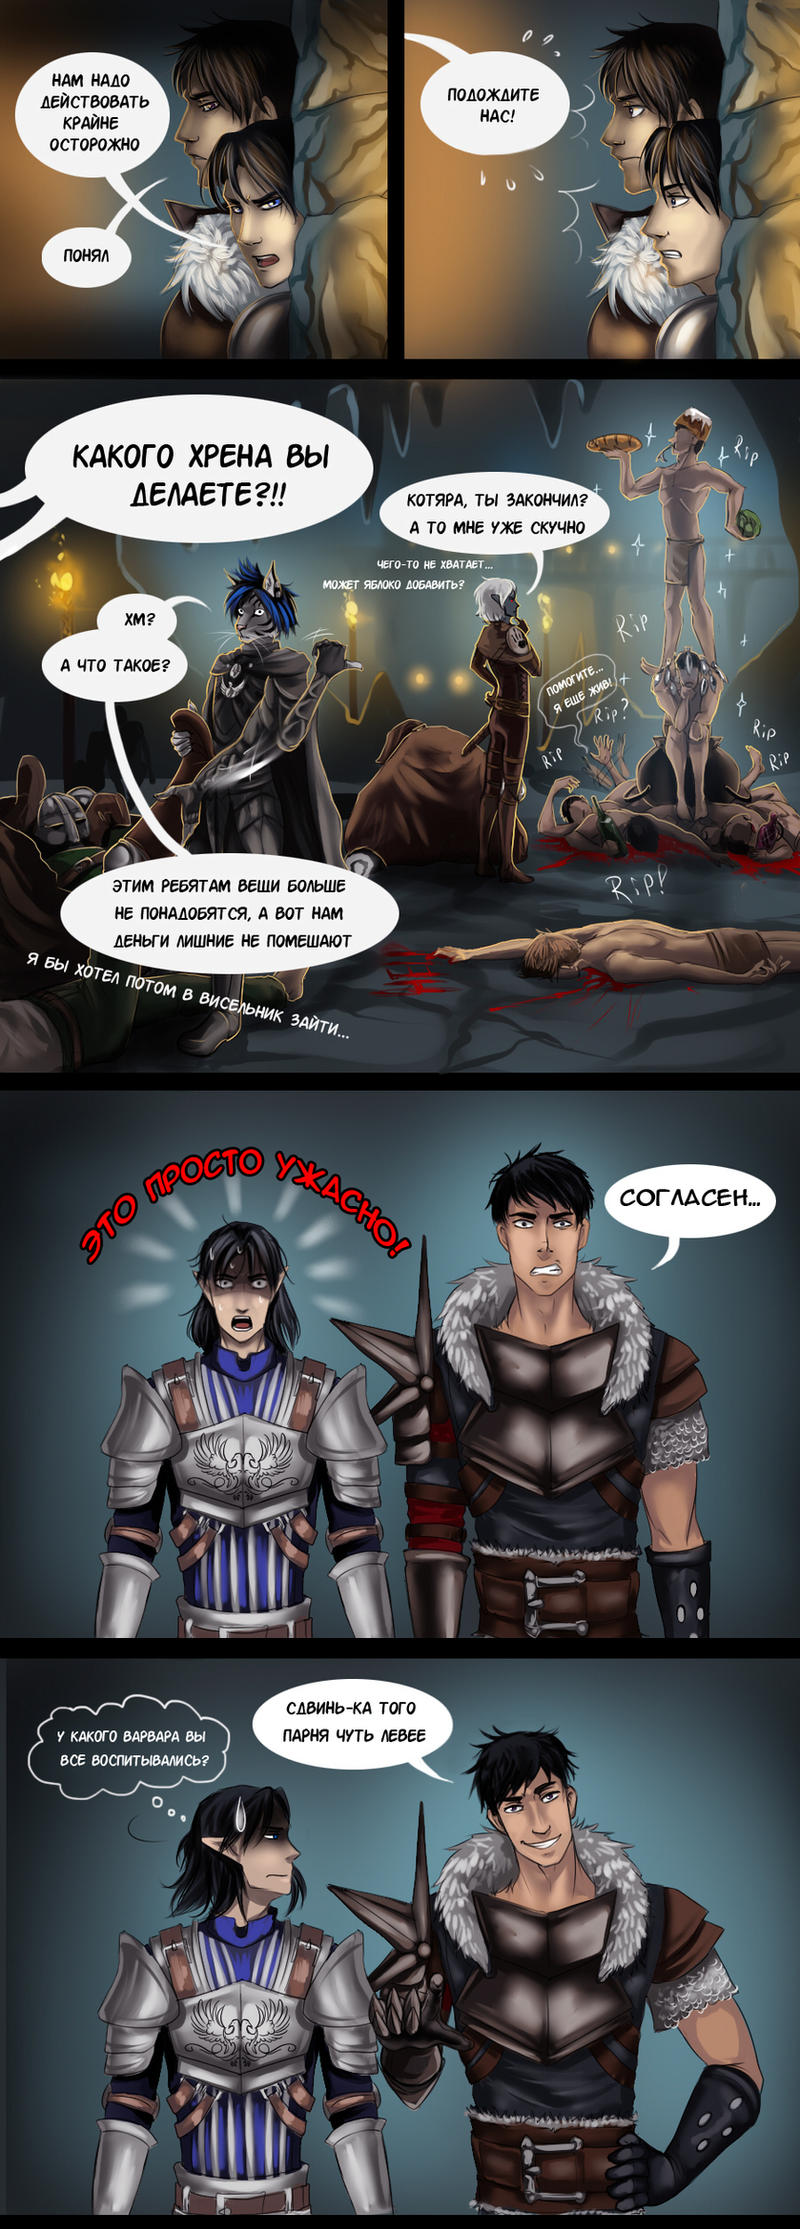 http://img15.deviantart.net/526f/i/2014/261/9/0/dragon_age_vs_tes_15_by_soltia-d7sdnhj.jpg